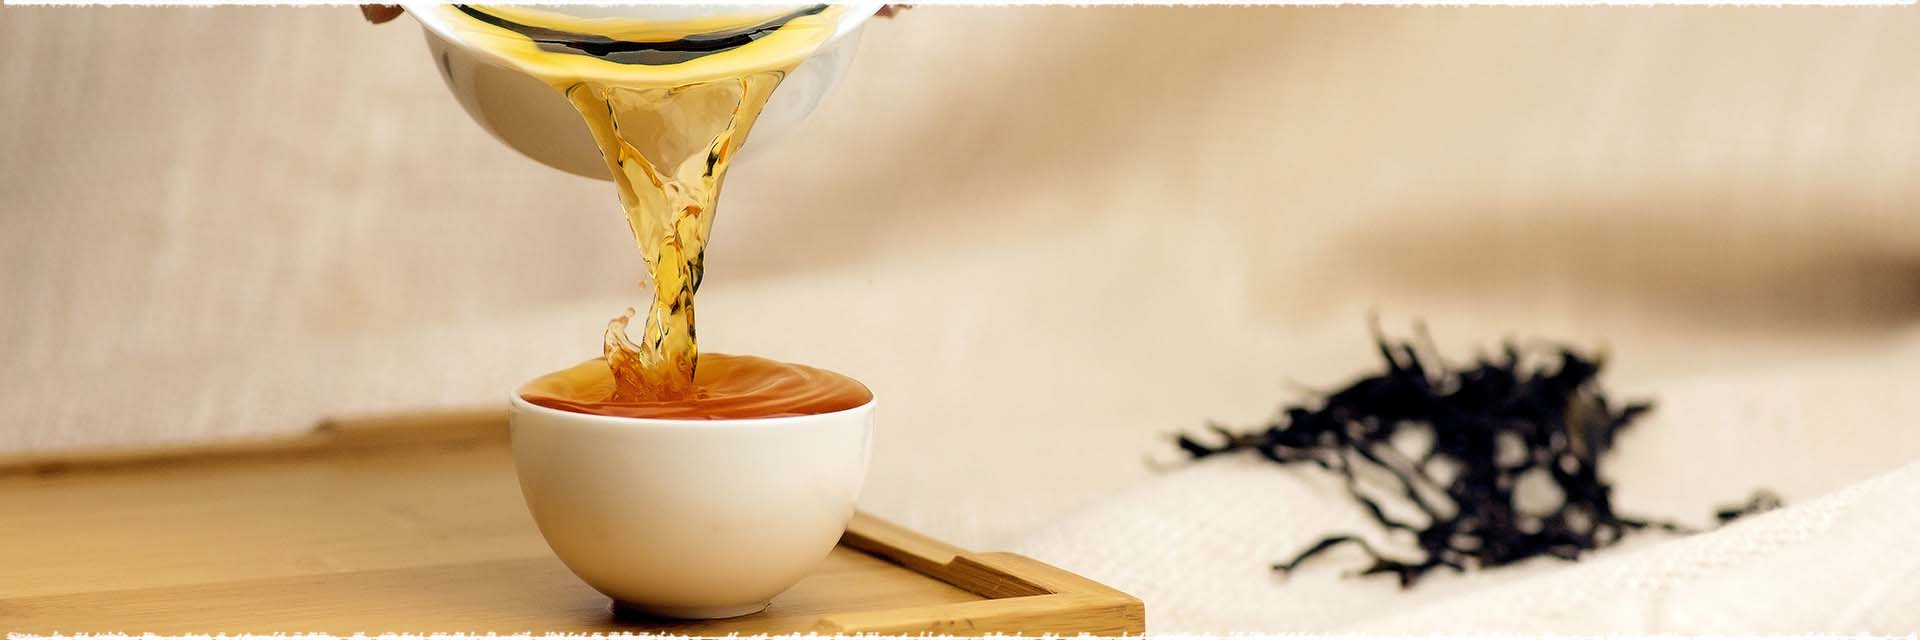 delicous black tea